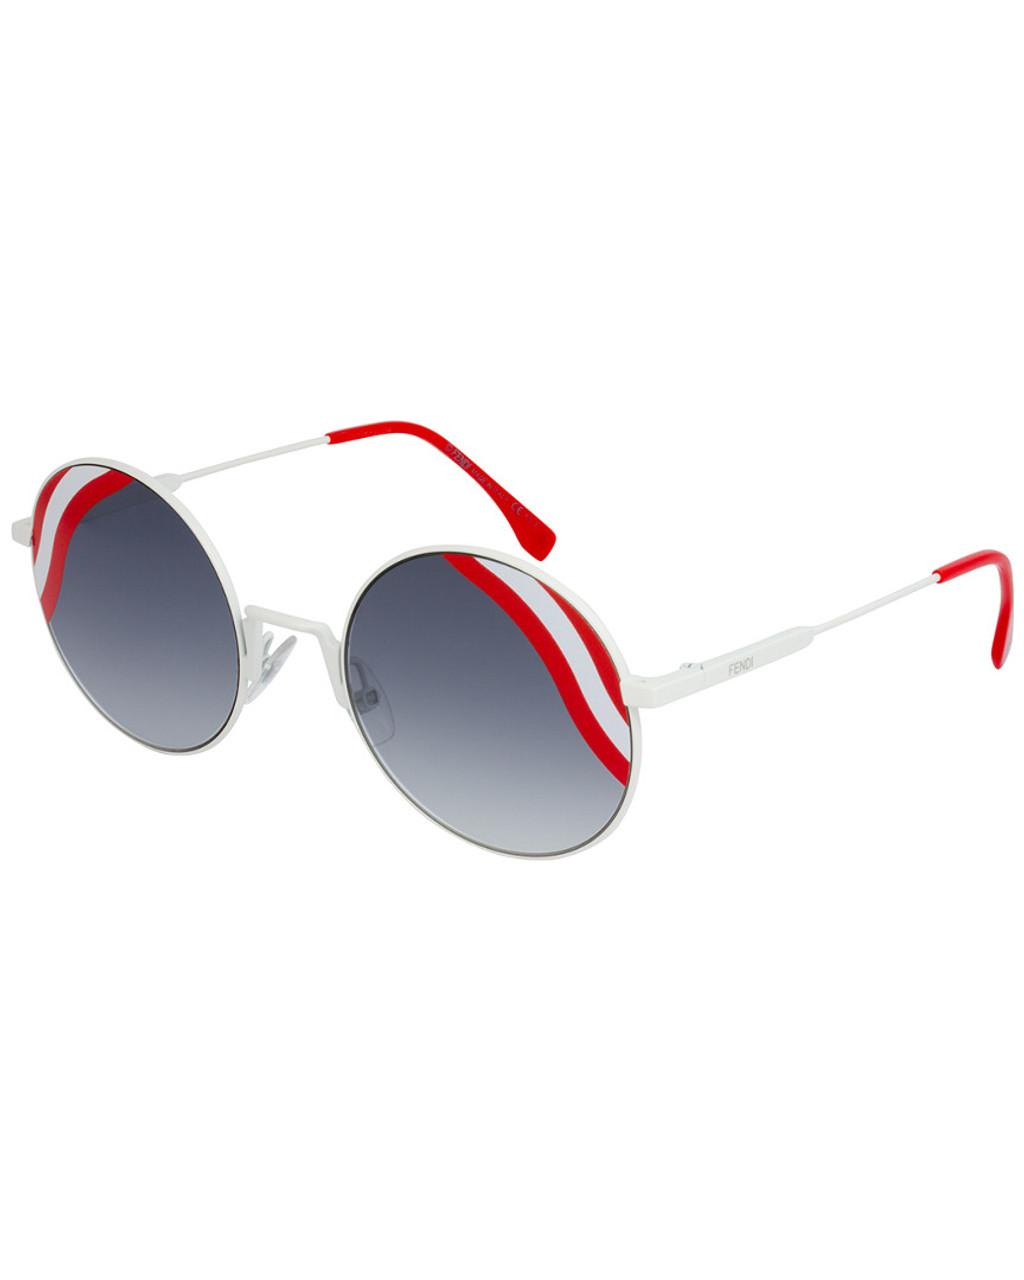 d742388a2ed2 FENDI Women s FF 0248 S 53mm Sunglasses~1111036203 - Elder-Beerman